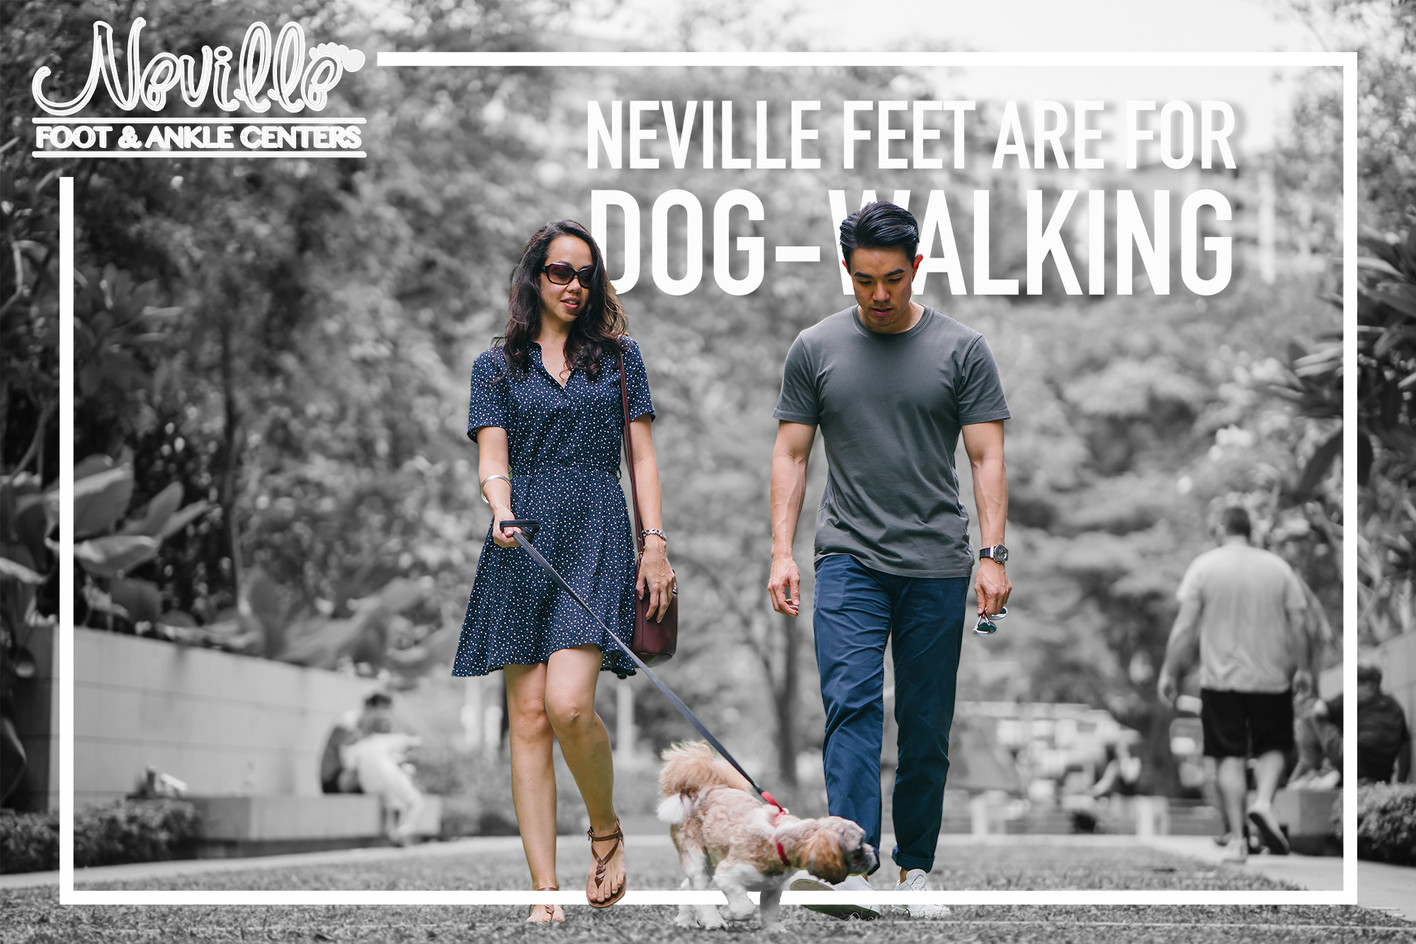 Dog walking feet!